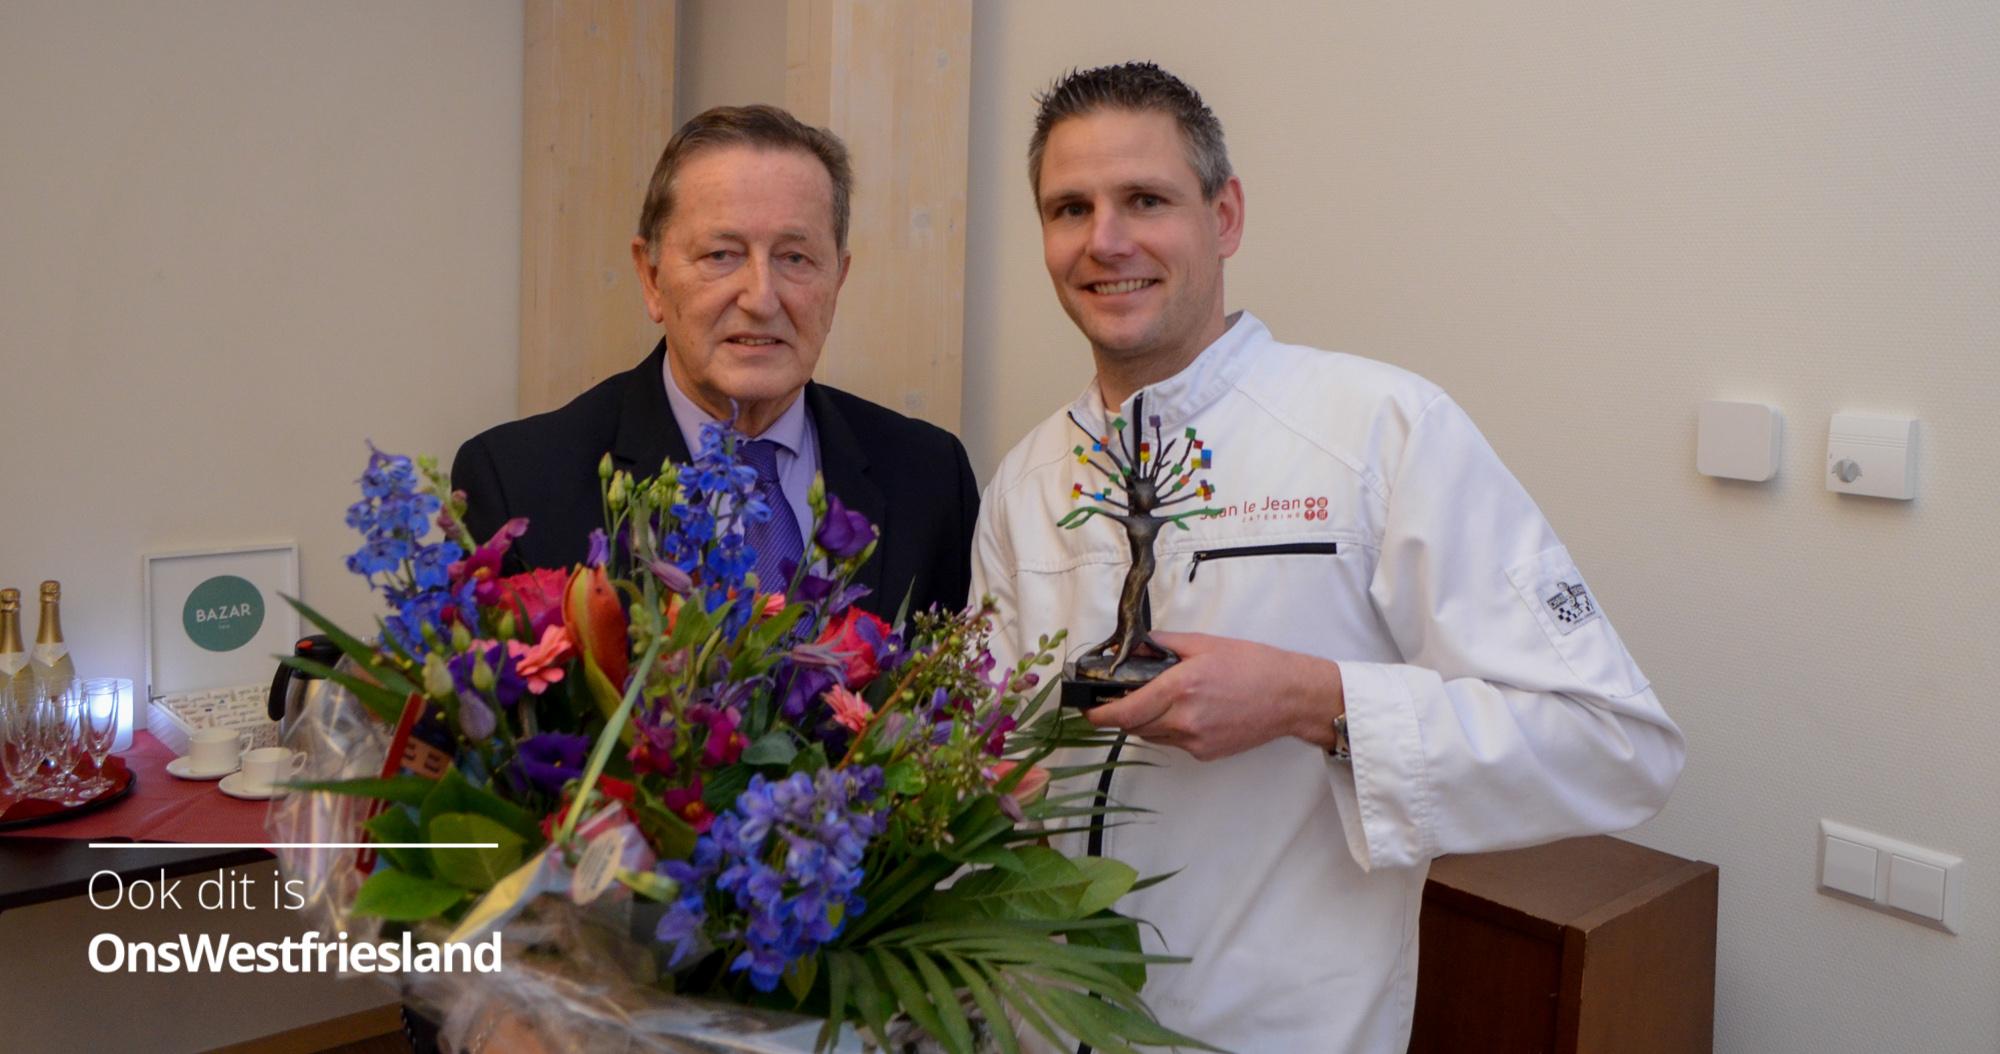 Award Duurzame Ondernemer voor Jean le Jean Catering